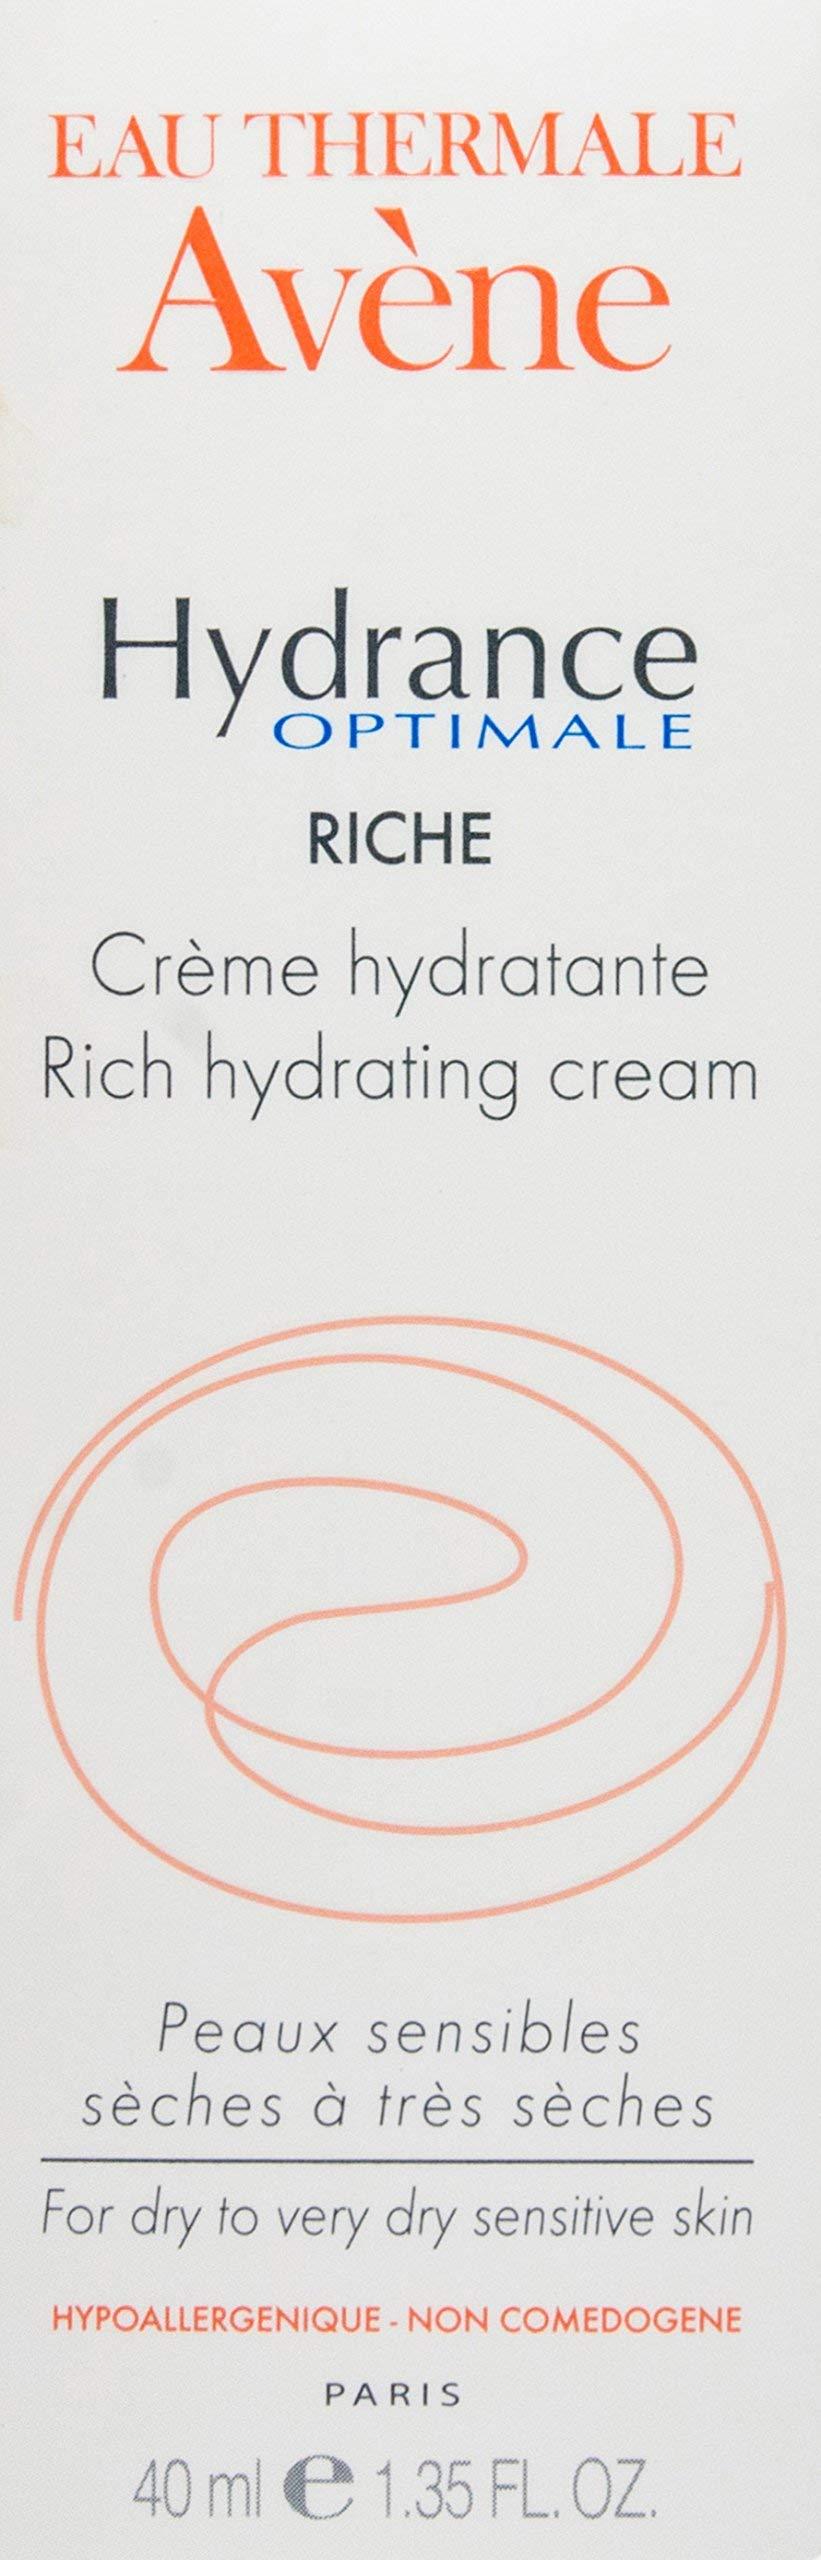 Eau Thermale Avene Hydrance RICH Hydrating Cream, Daily Face Moisturizer, Non-Comedogenic, 1.3 oz.